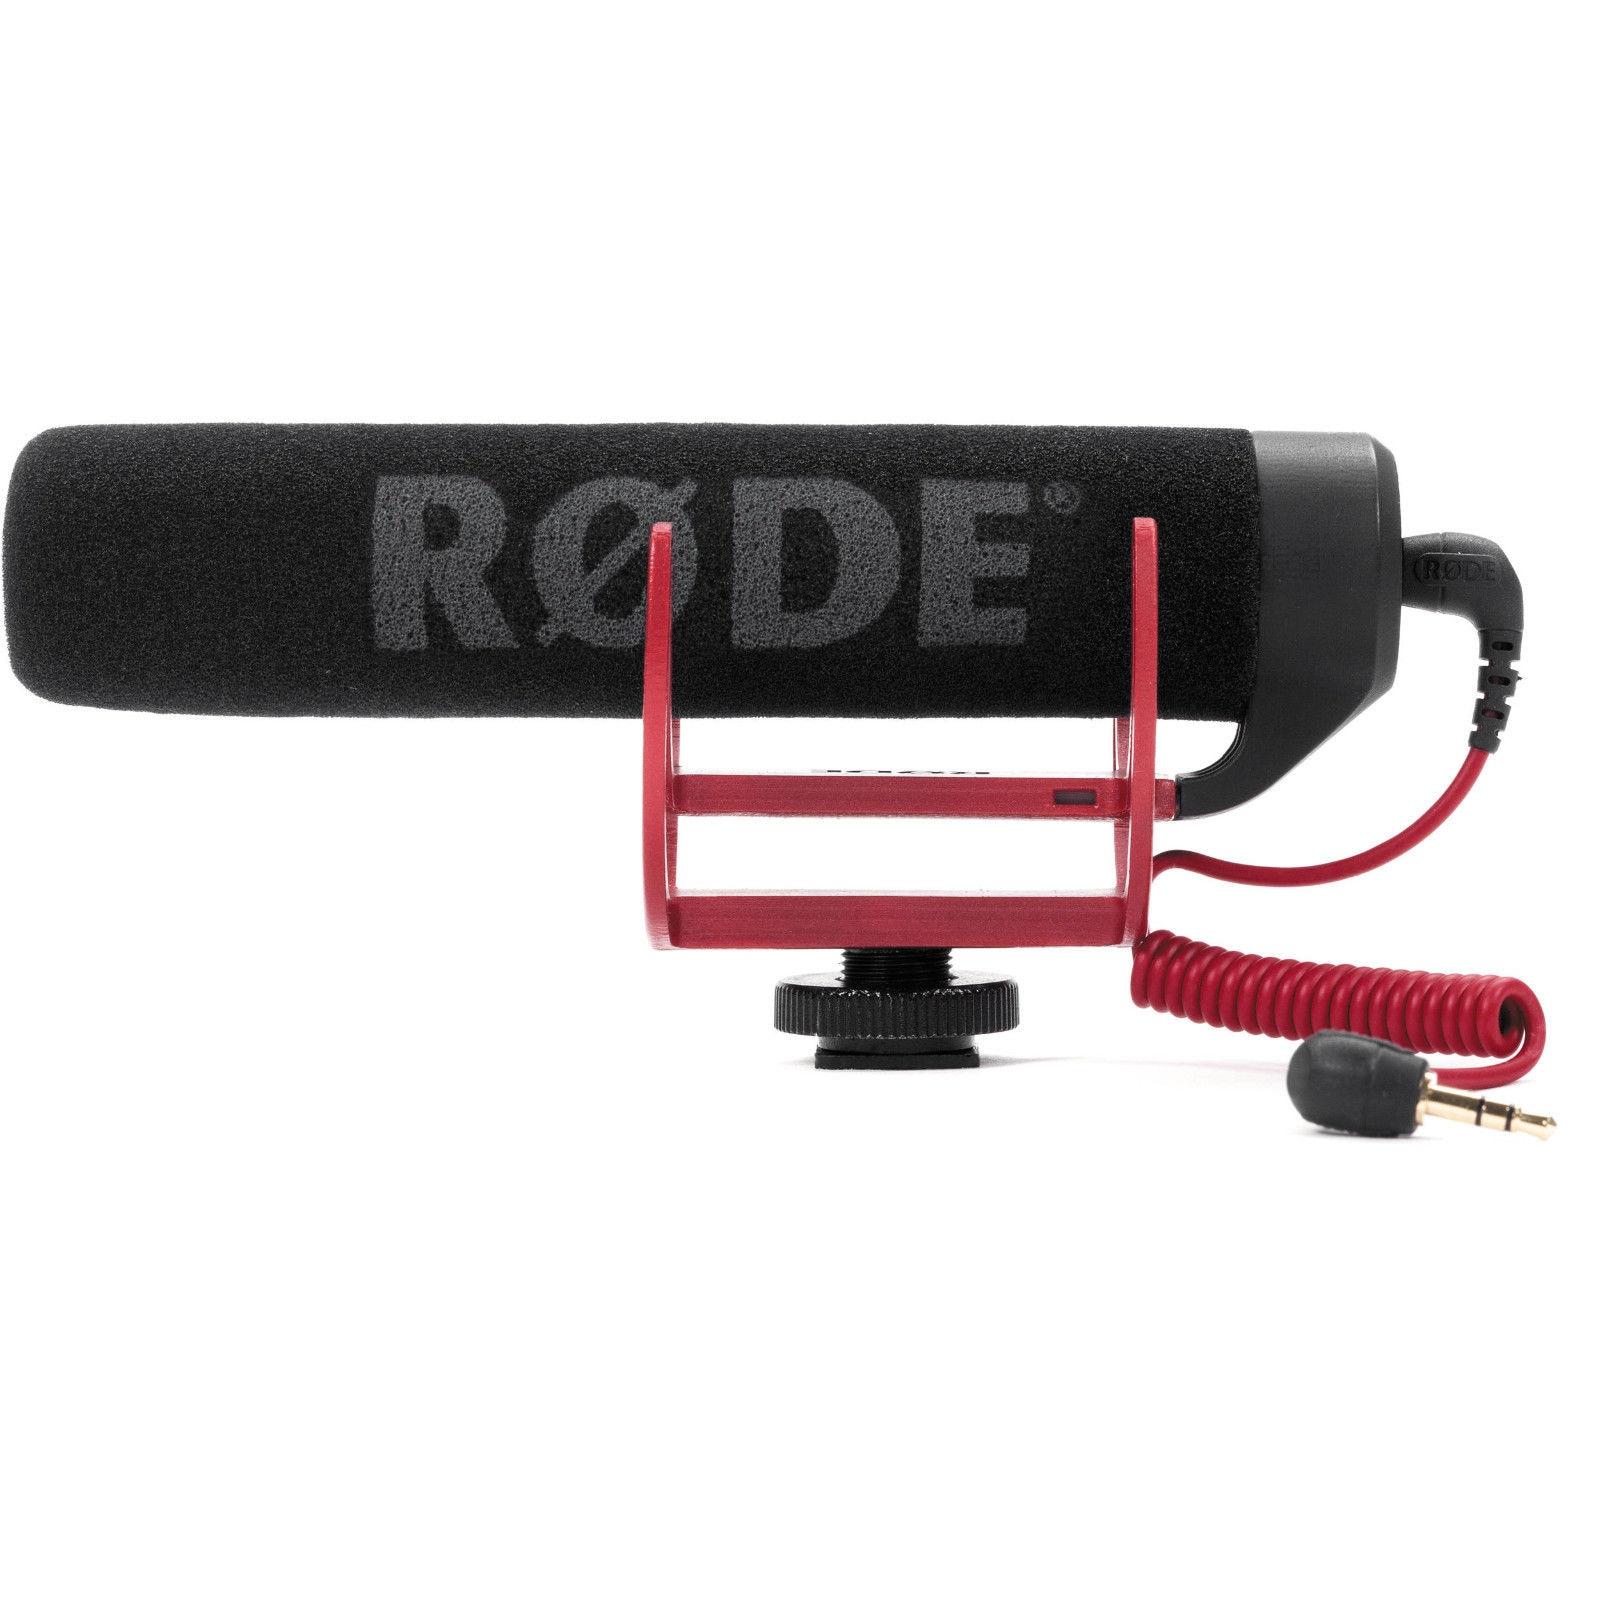 VideoMic Go Video On Camera Shoe Mount Rycote Lyre Onboard Microphone Mic shot gun for canon nikon sony dslr dv camera цена 2017